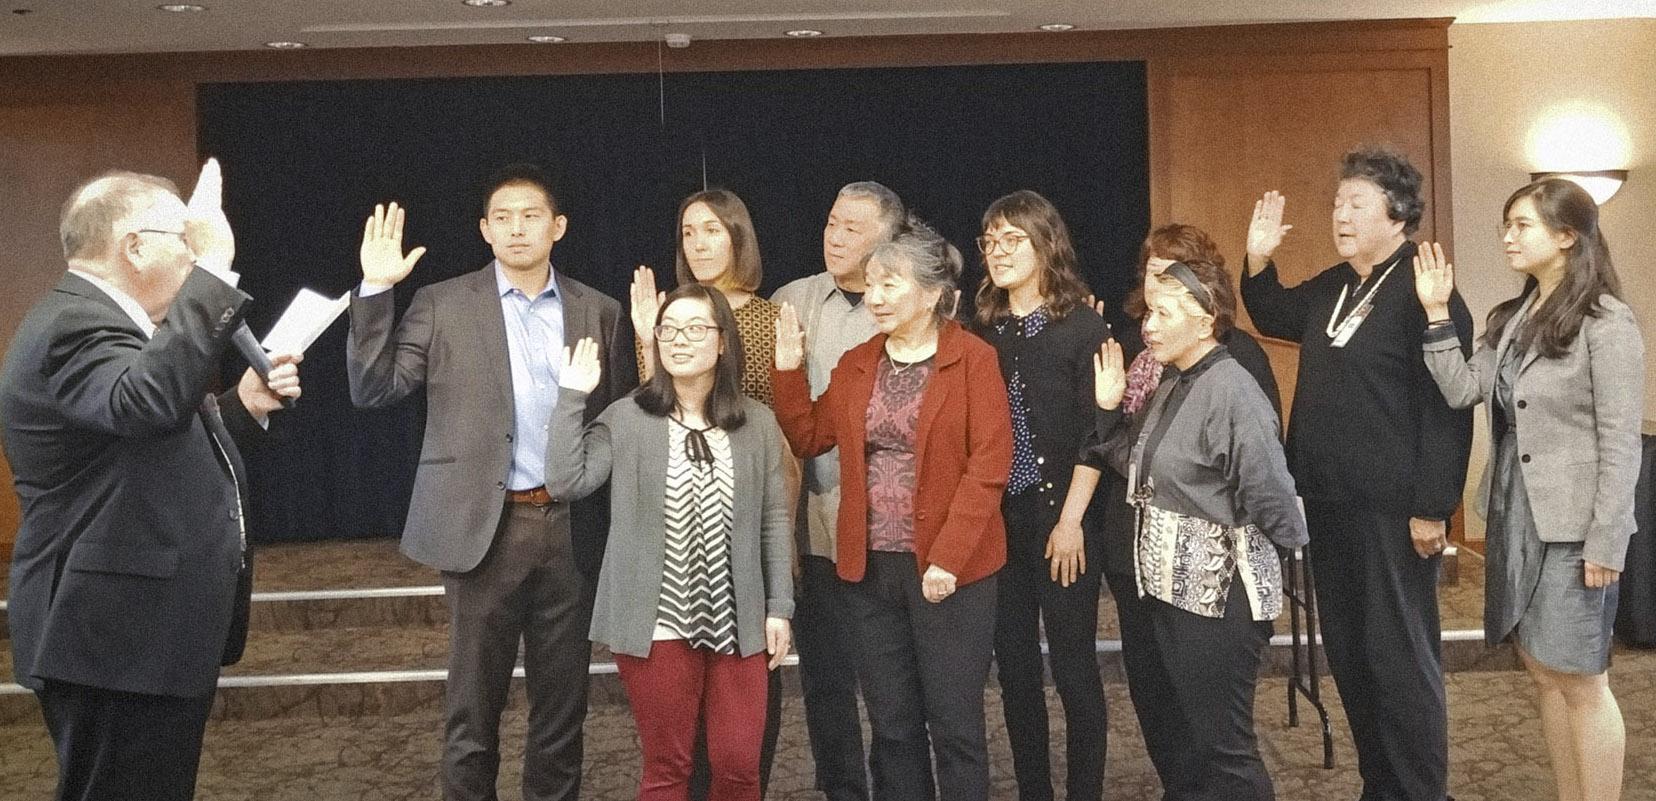 This year's officers include (back row, from left) Chris Lee, co-president; Amanda Shanahan, co-president; Jeff Matsumoto, vp; Jennifer Yamada, board member; Heidi Tolentino, secretary; Setsy Larouche, membership chair; and Sachi Kaneko, board member; and (front row, from left) Jillian Toda-Currie, treasurer; Marleen Wallingford, past chapter president and board member; and Connie Masuoka, board member.